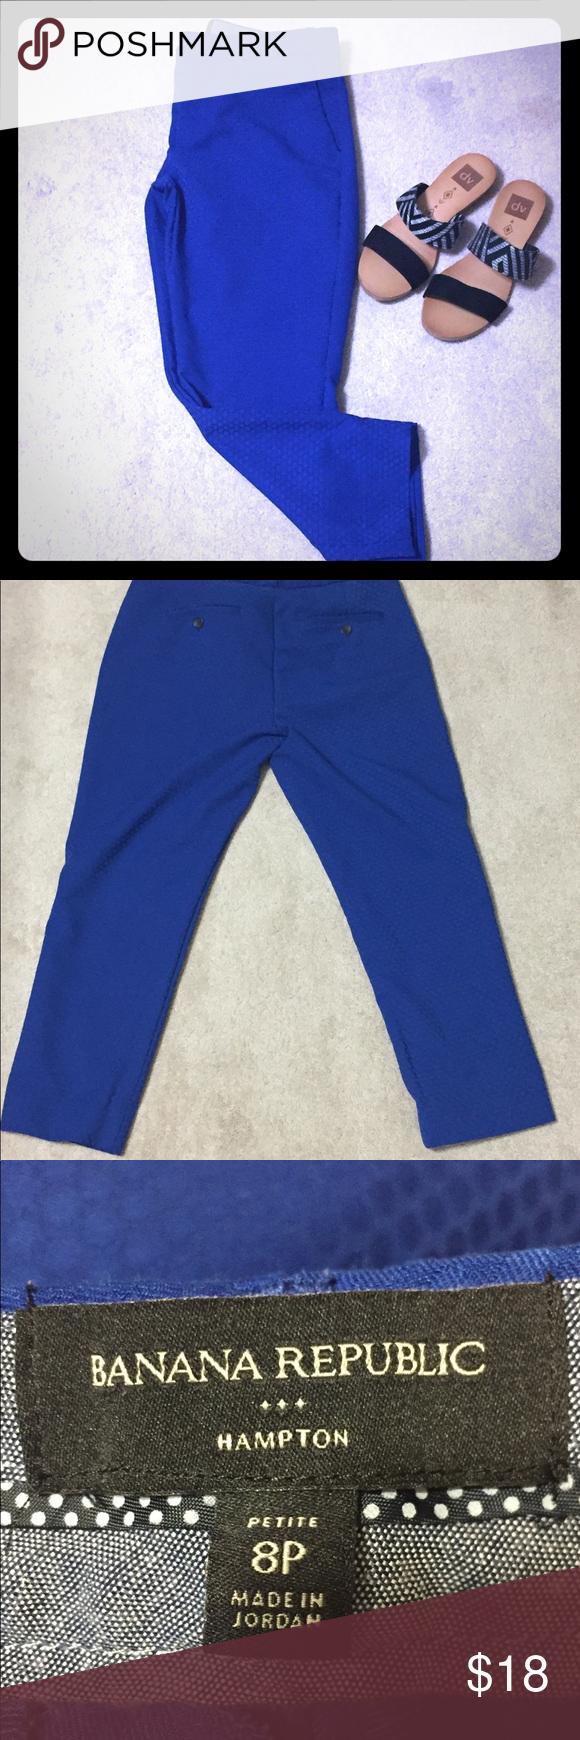 7316e950b4 Banana Republic Hampton Dress Pants Fun bright blue color, size 8 petite. I  typically wear a size 6 and am 5'4